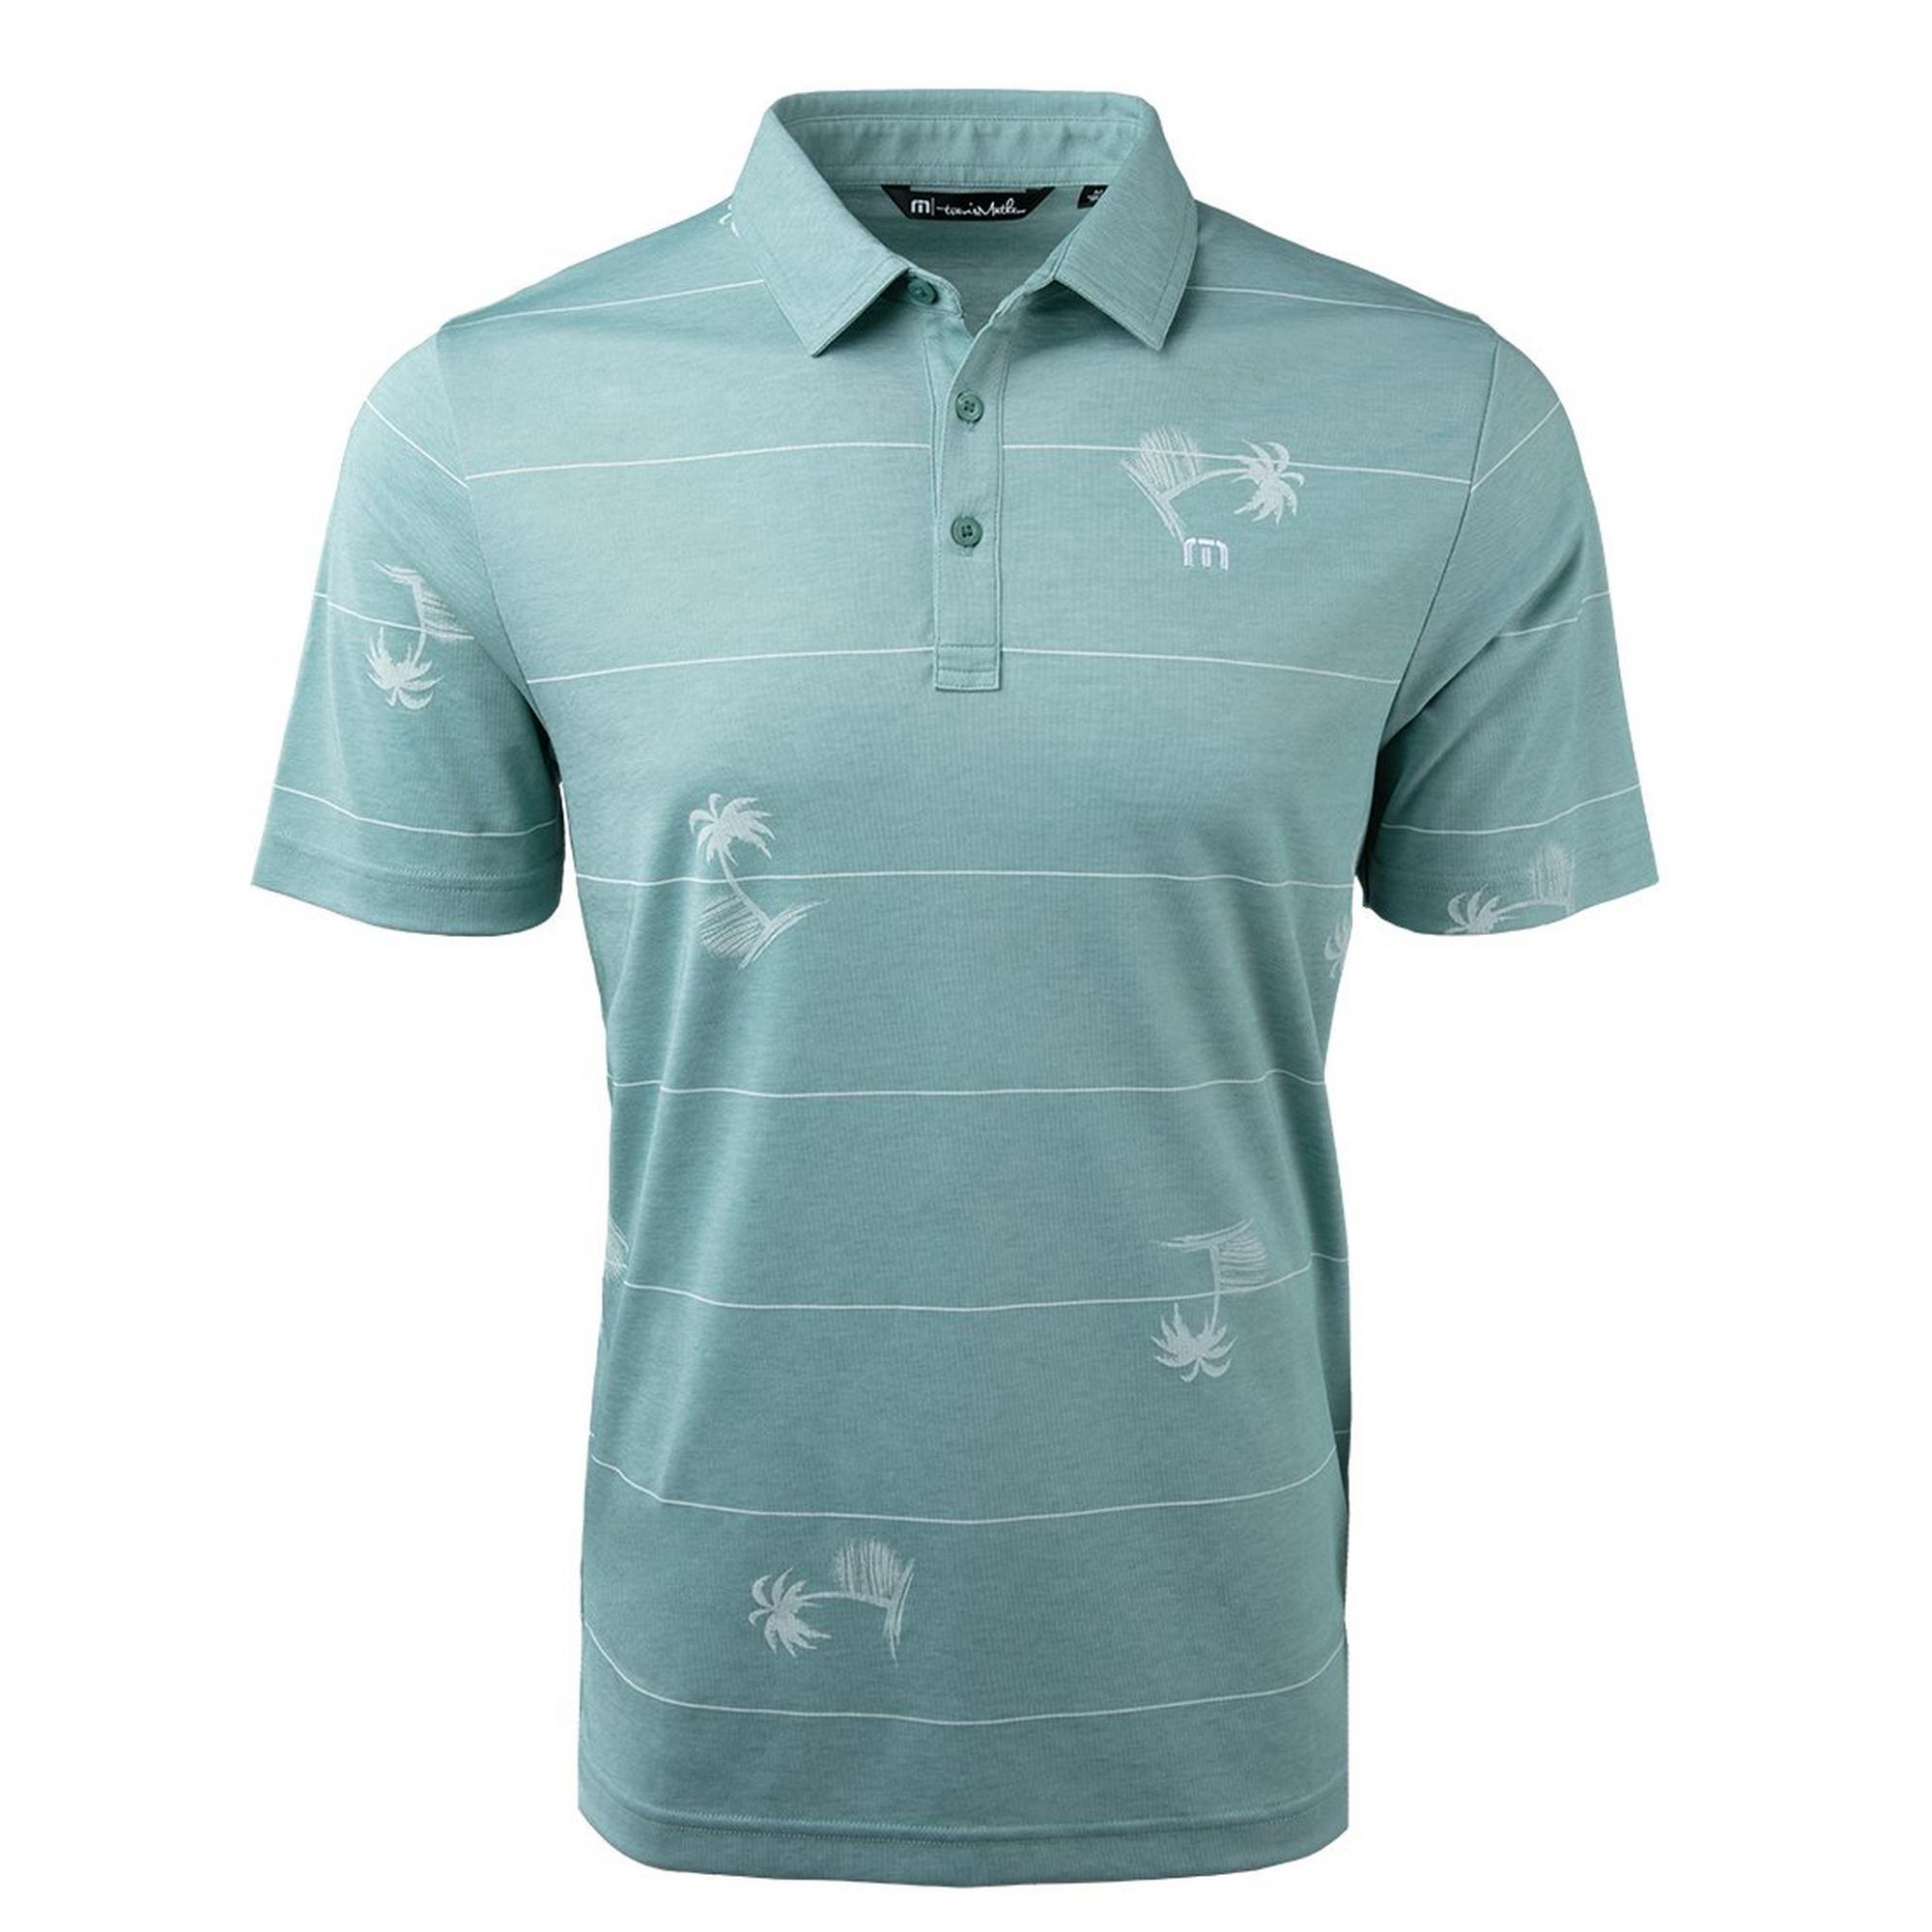 Men's Out of Office Short Sleeve Shirt